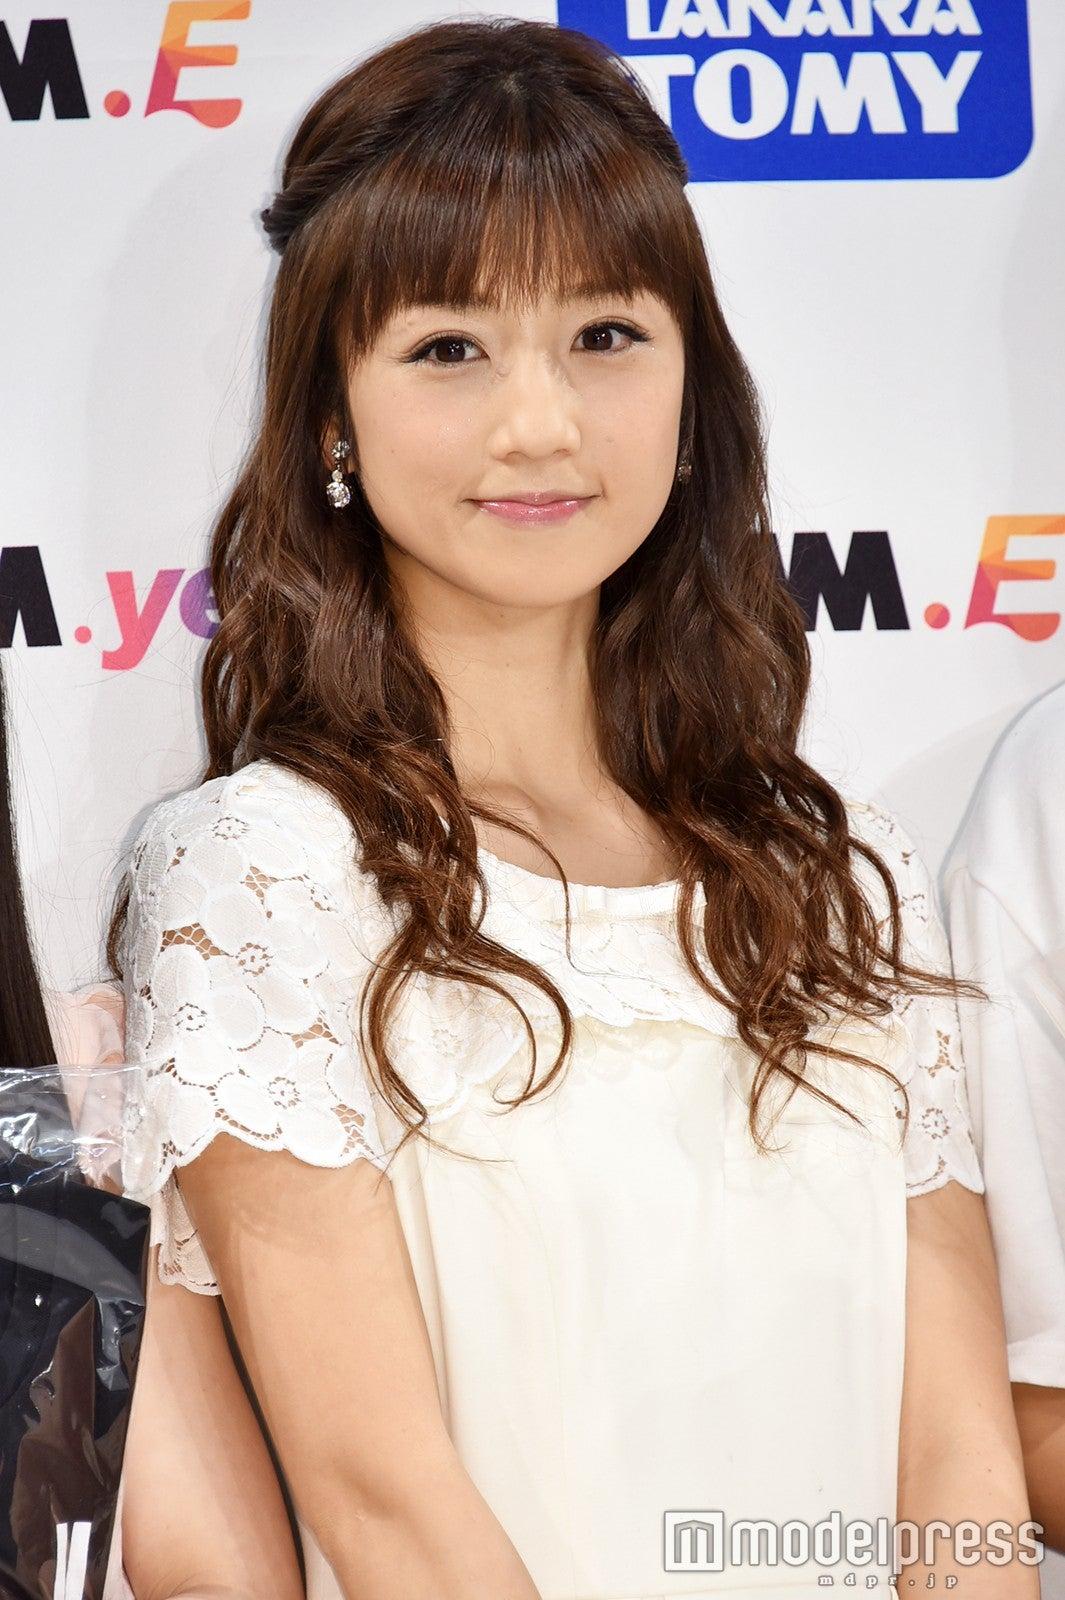 小倉優子 modelpress Twitter